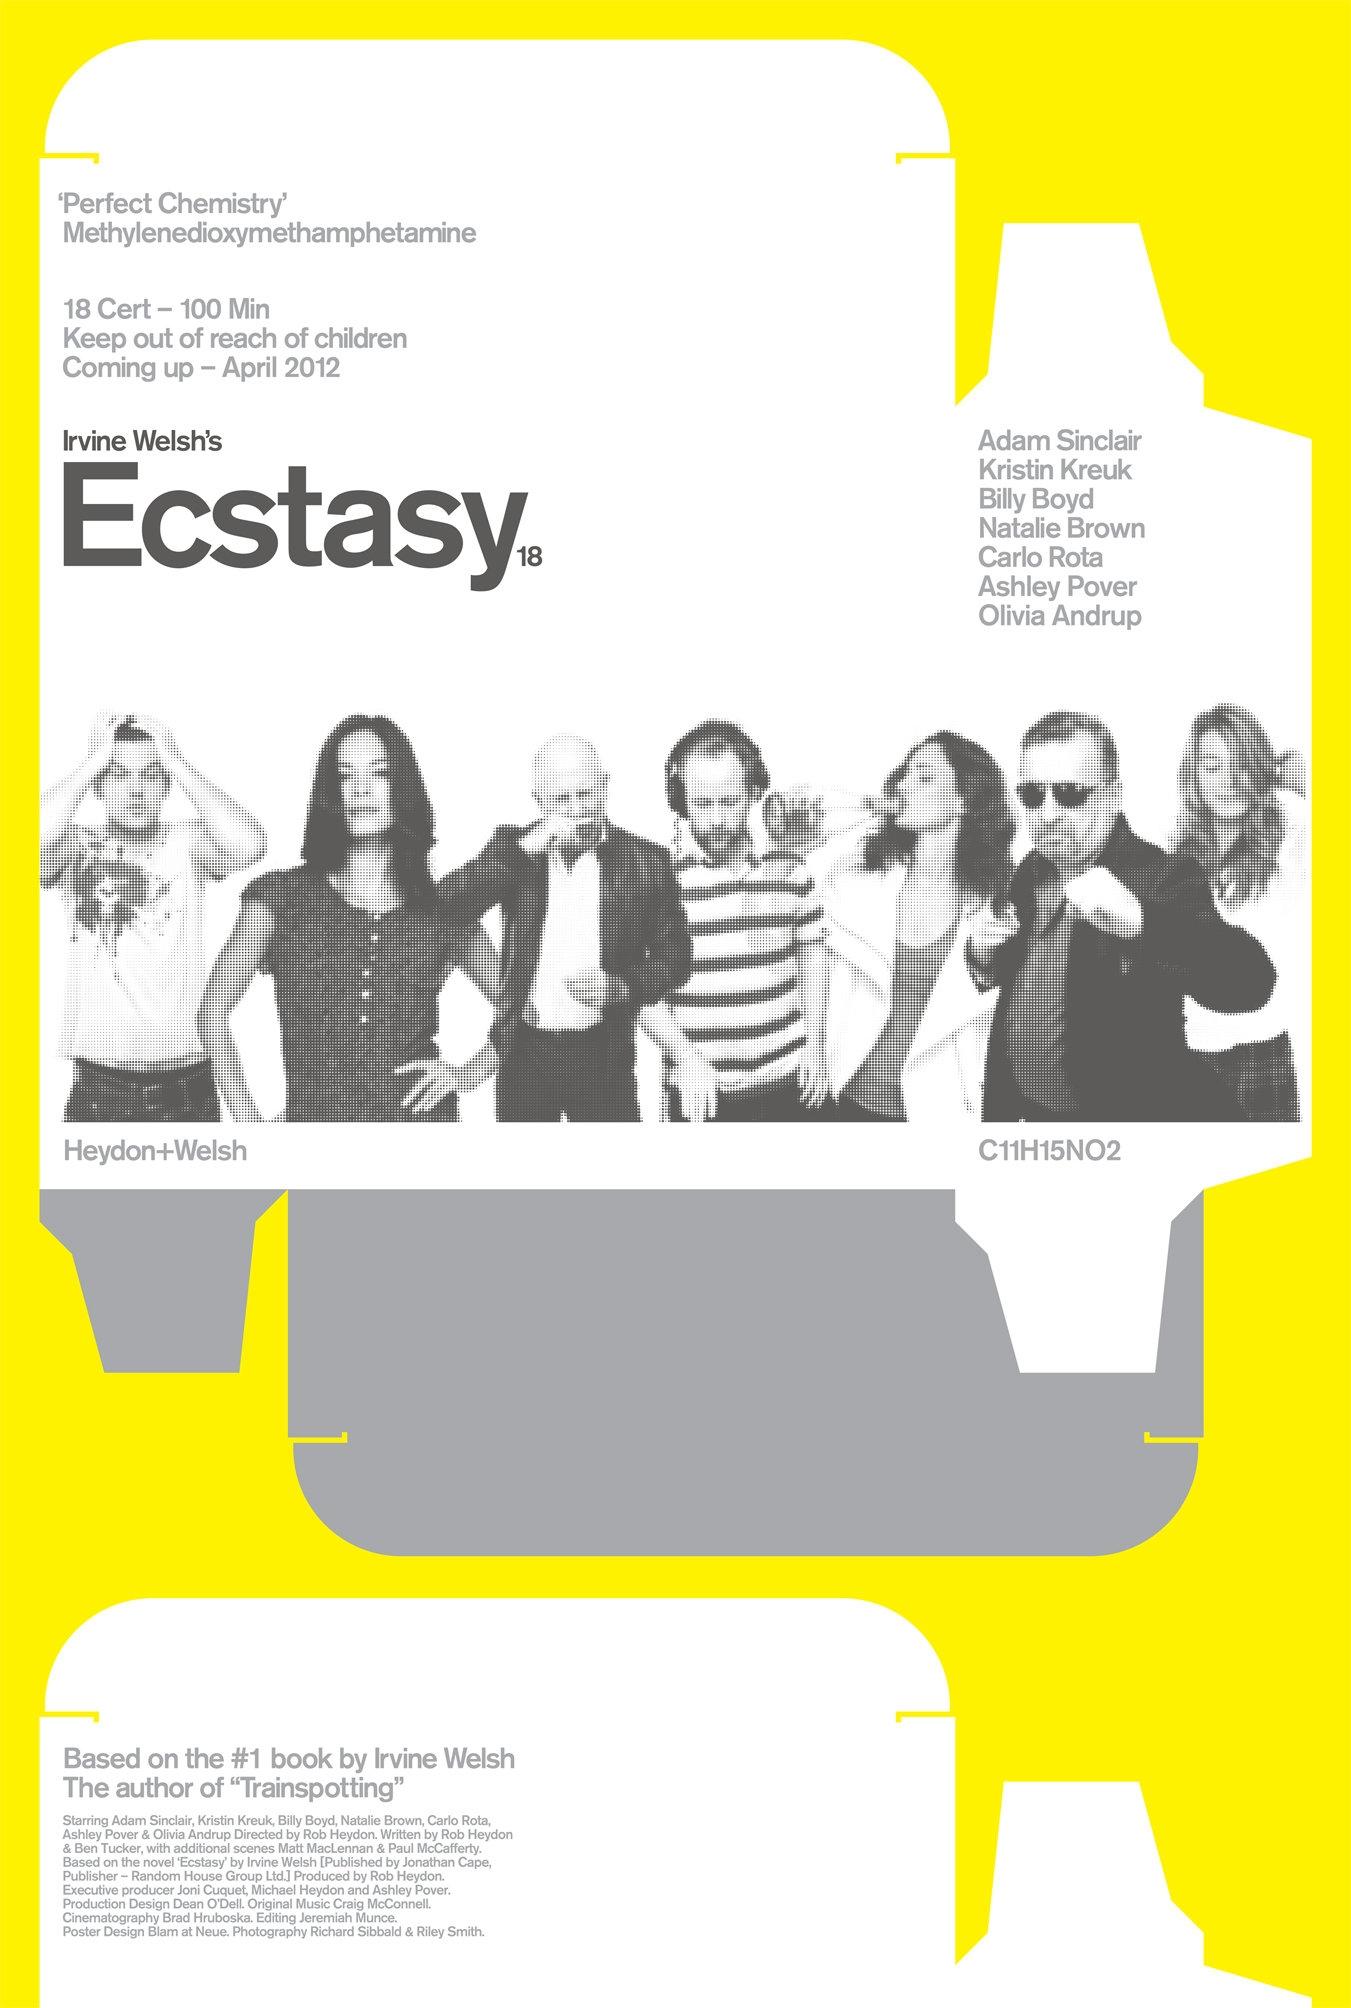 La locandina di Irvine Welsh's Ecstasy